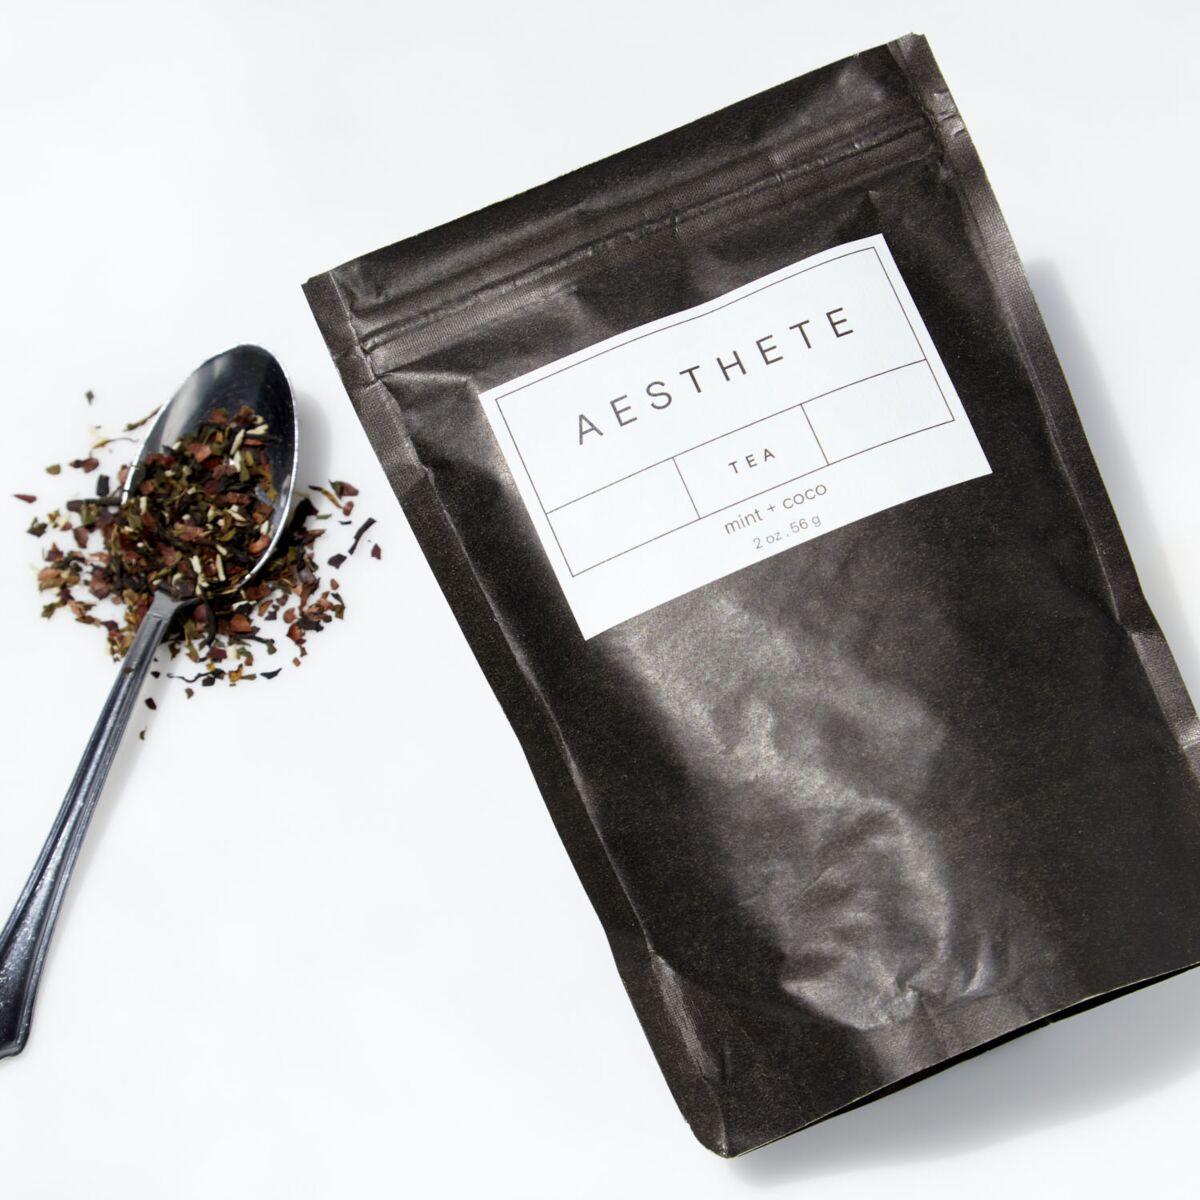 Mint + Coco Tea image